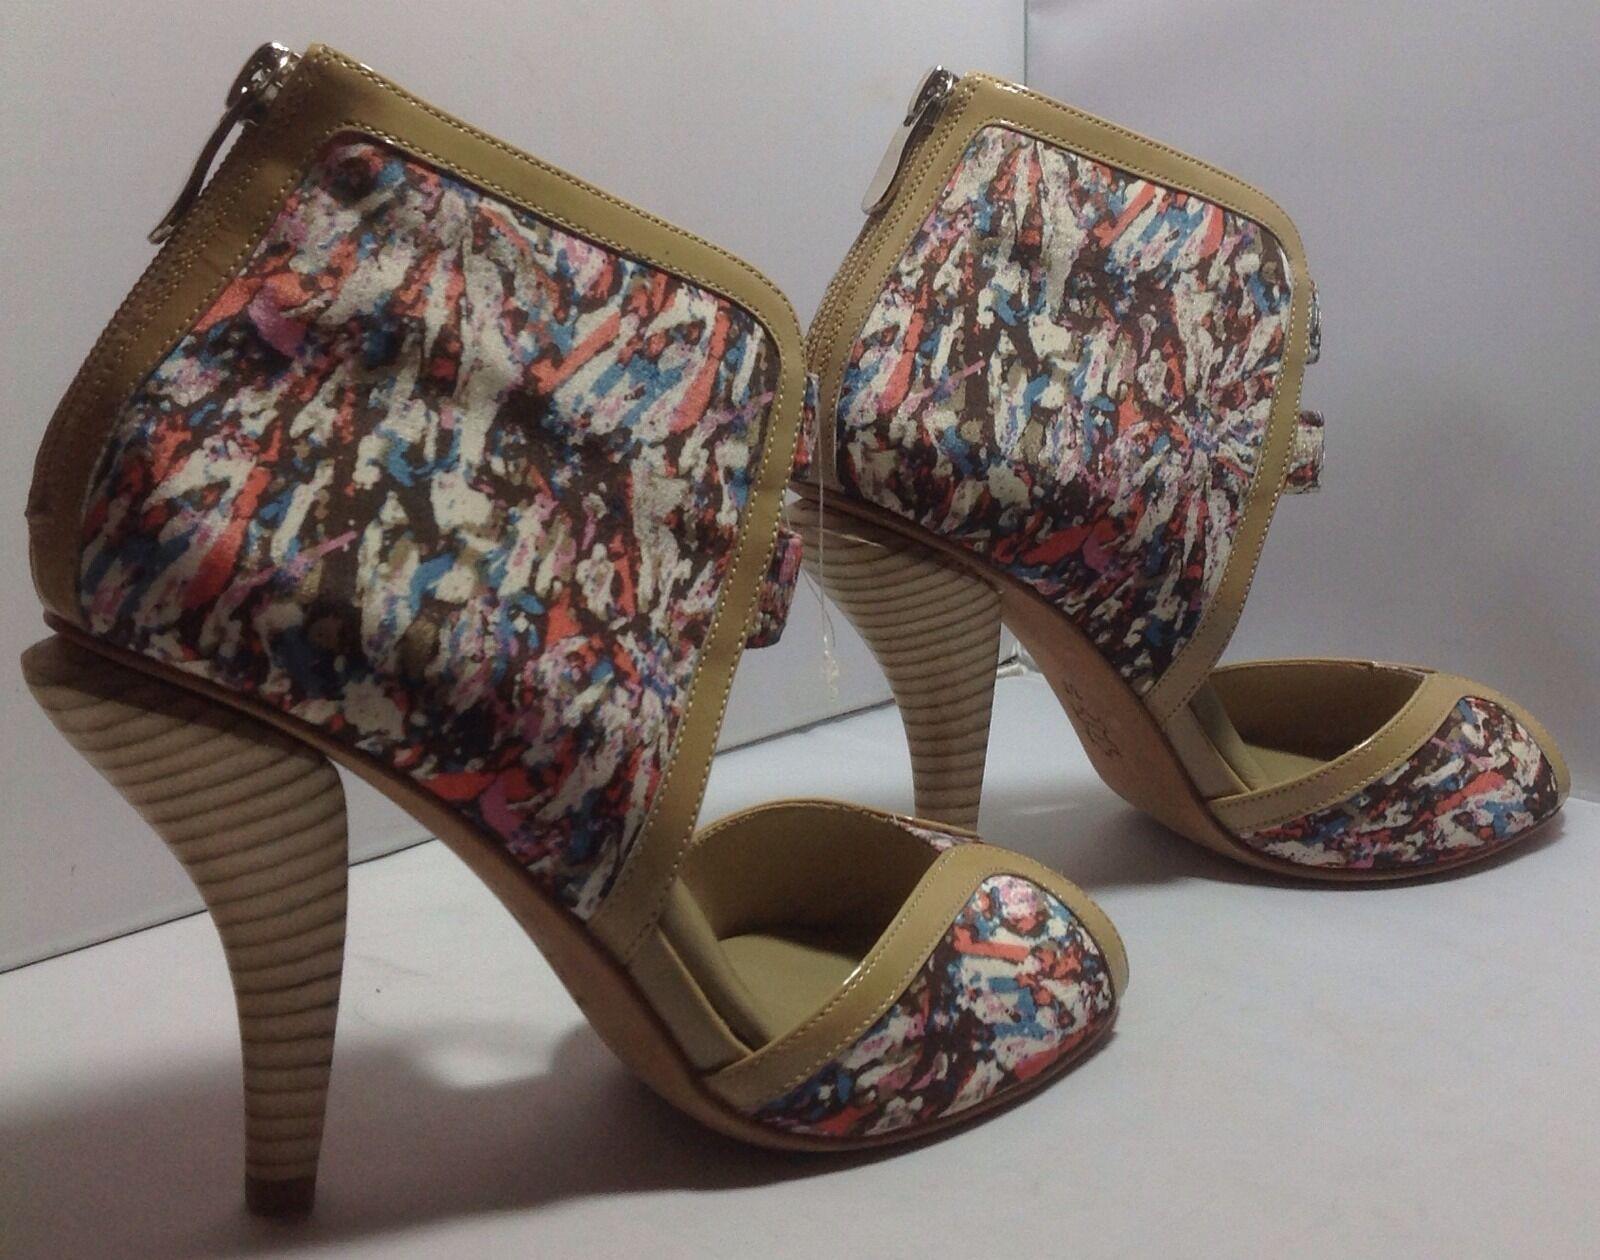 New Ask Alice Multi Farbeed Zip Booties High Heeled Peep-toe Fabric Booties Zip Größe 37 5f7d08